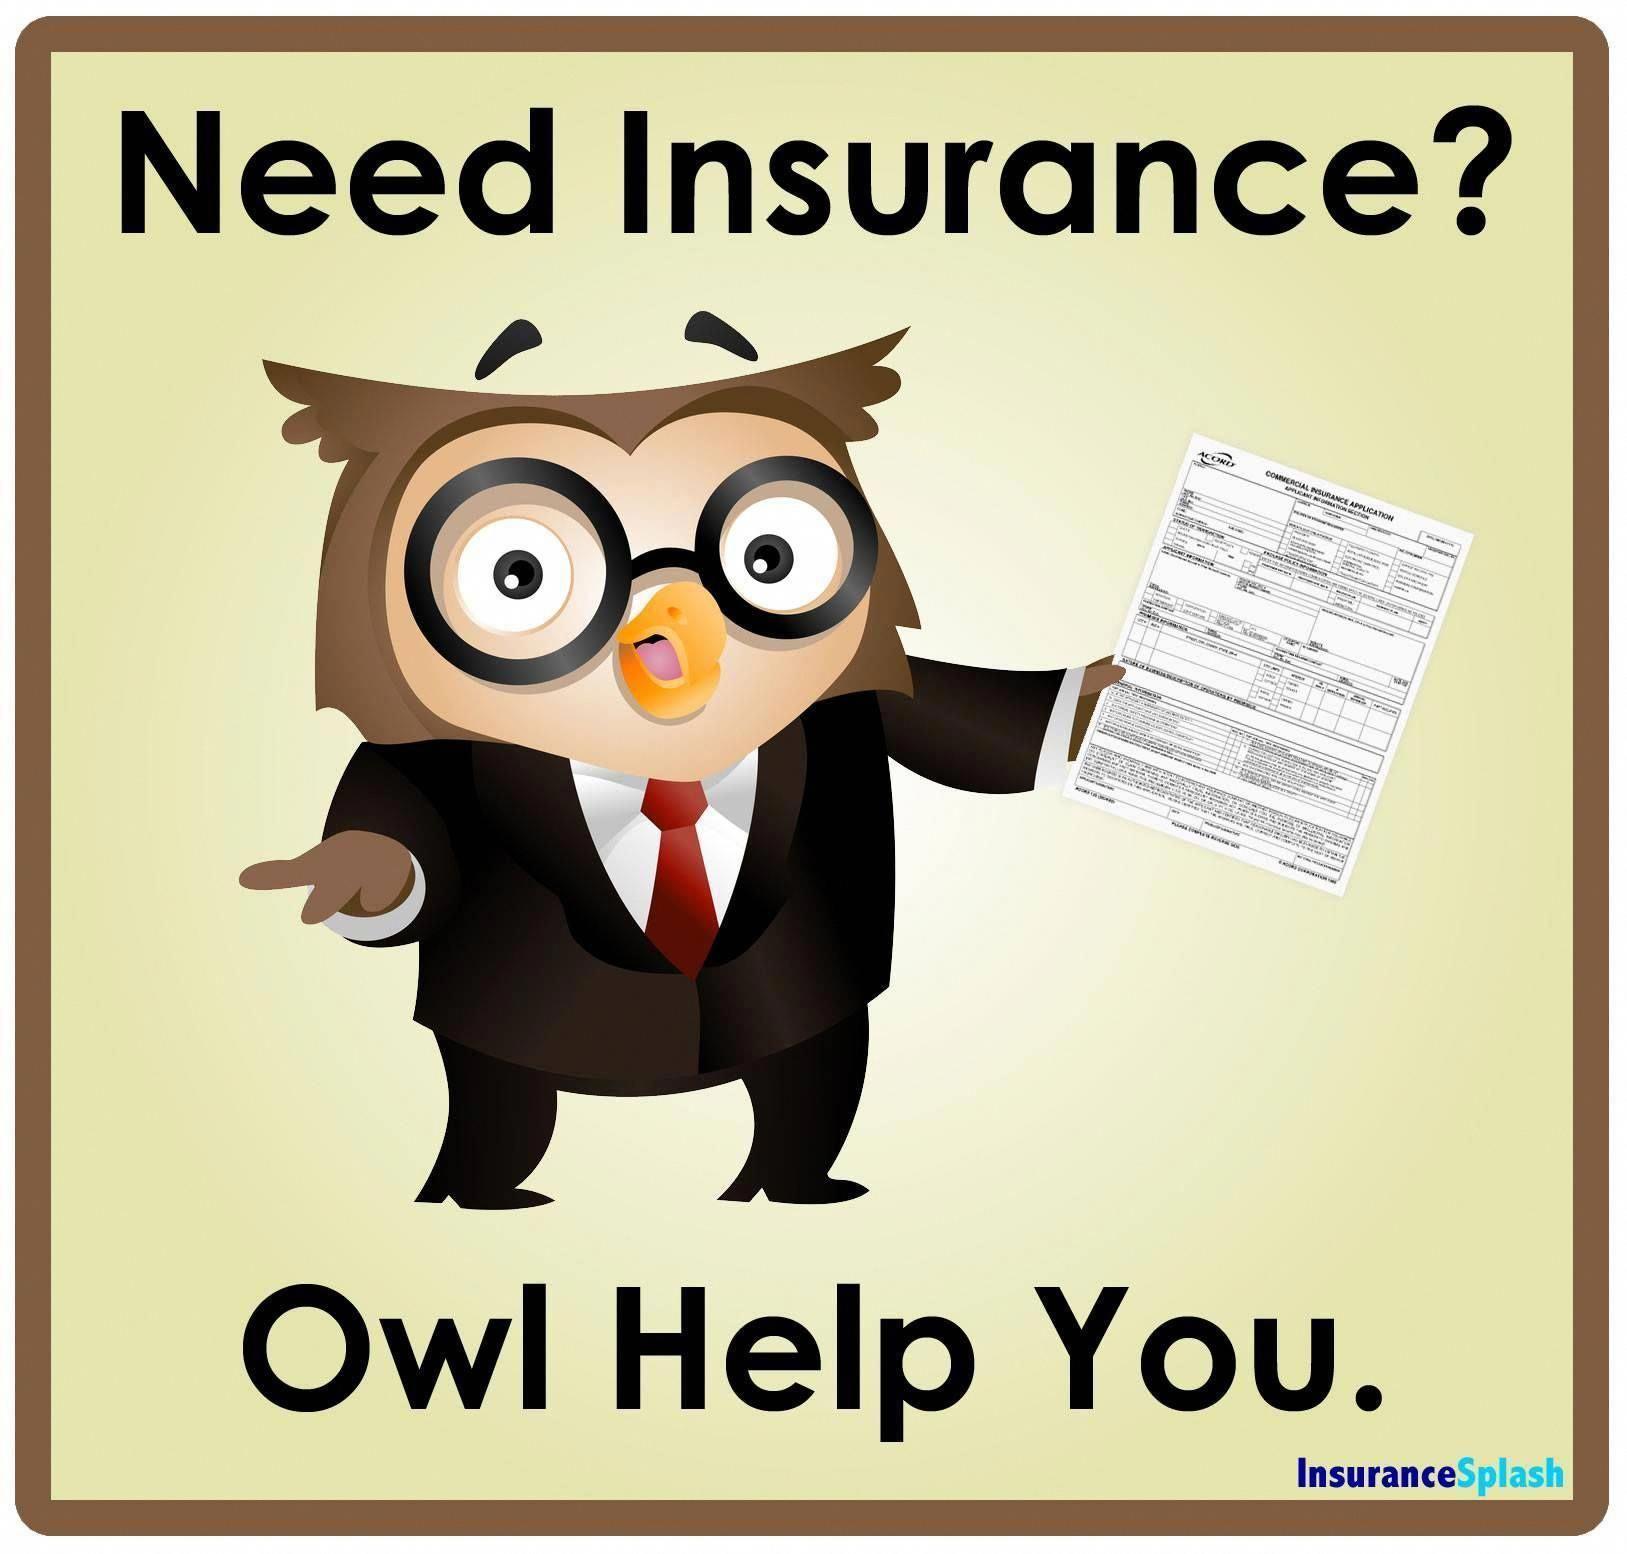 Whoooo needs insurance? autoinsurancequotes Home